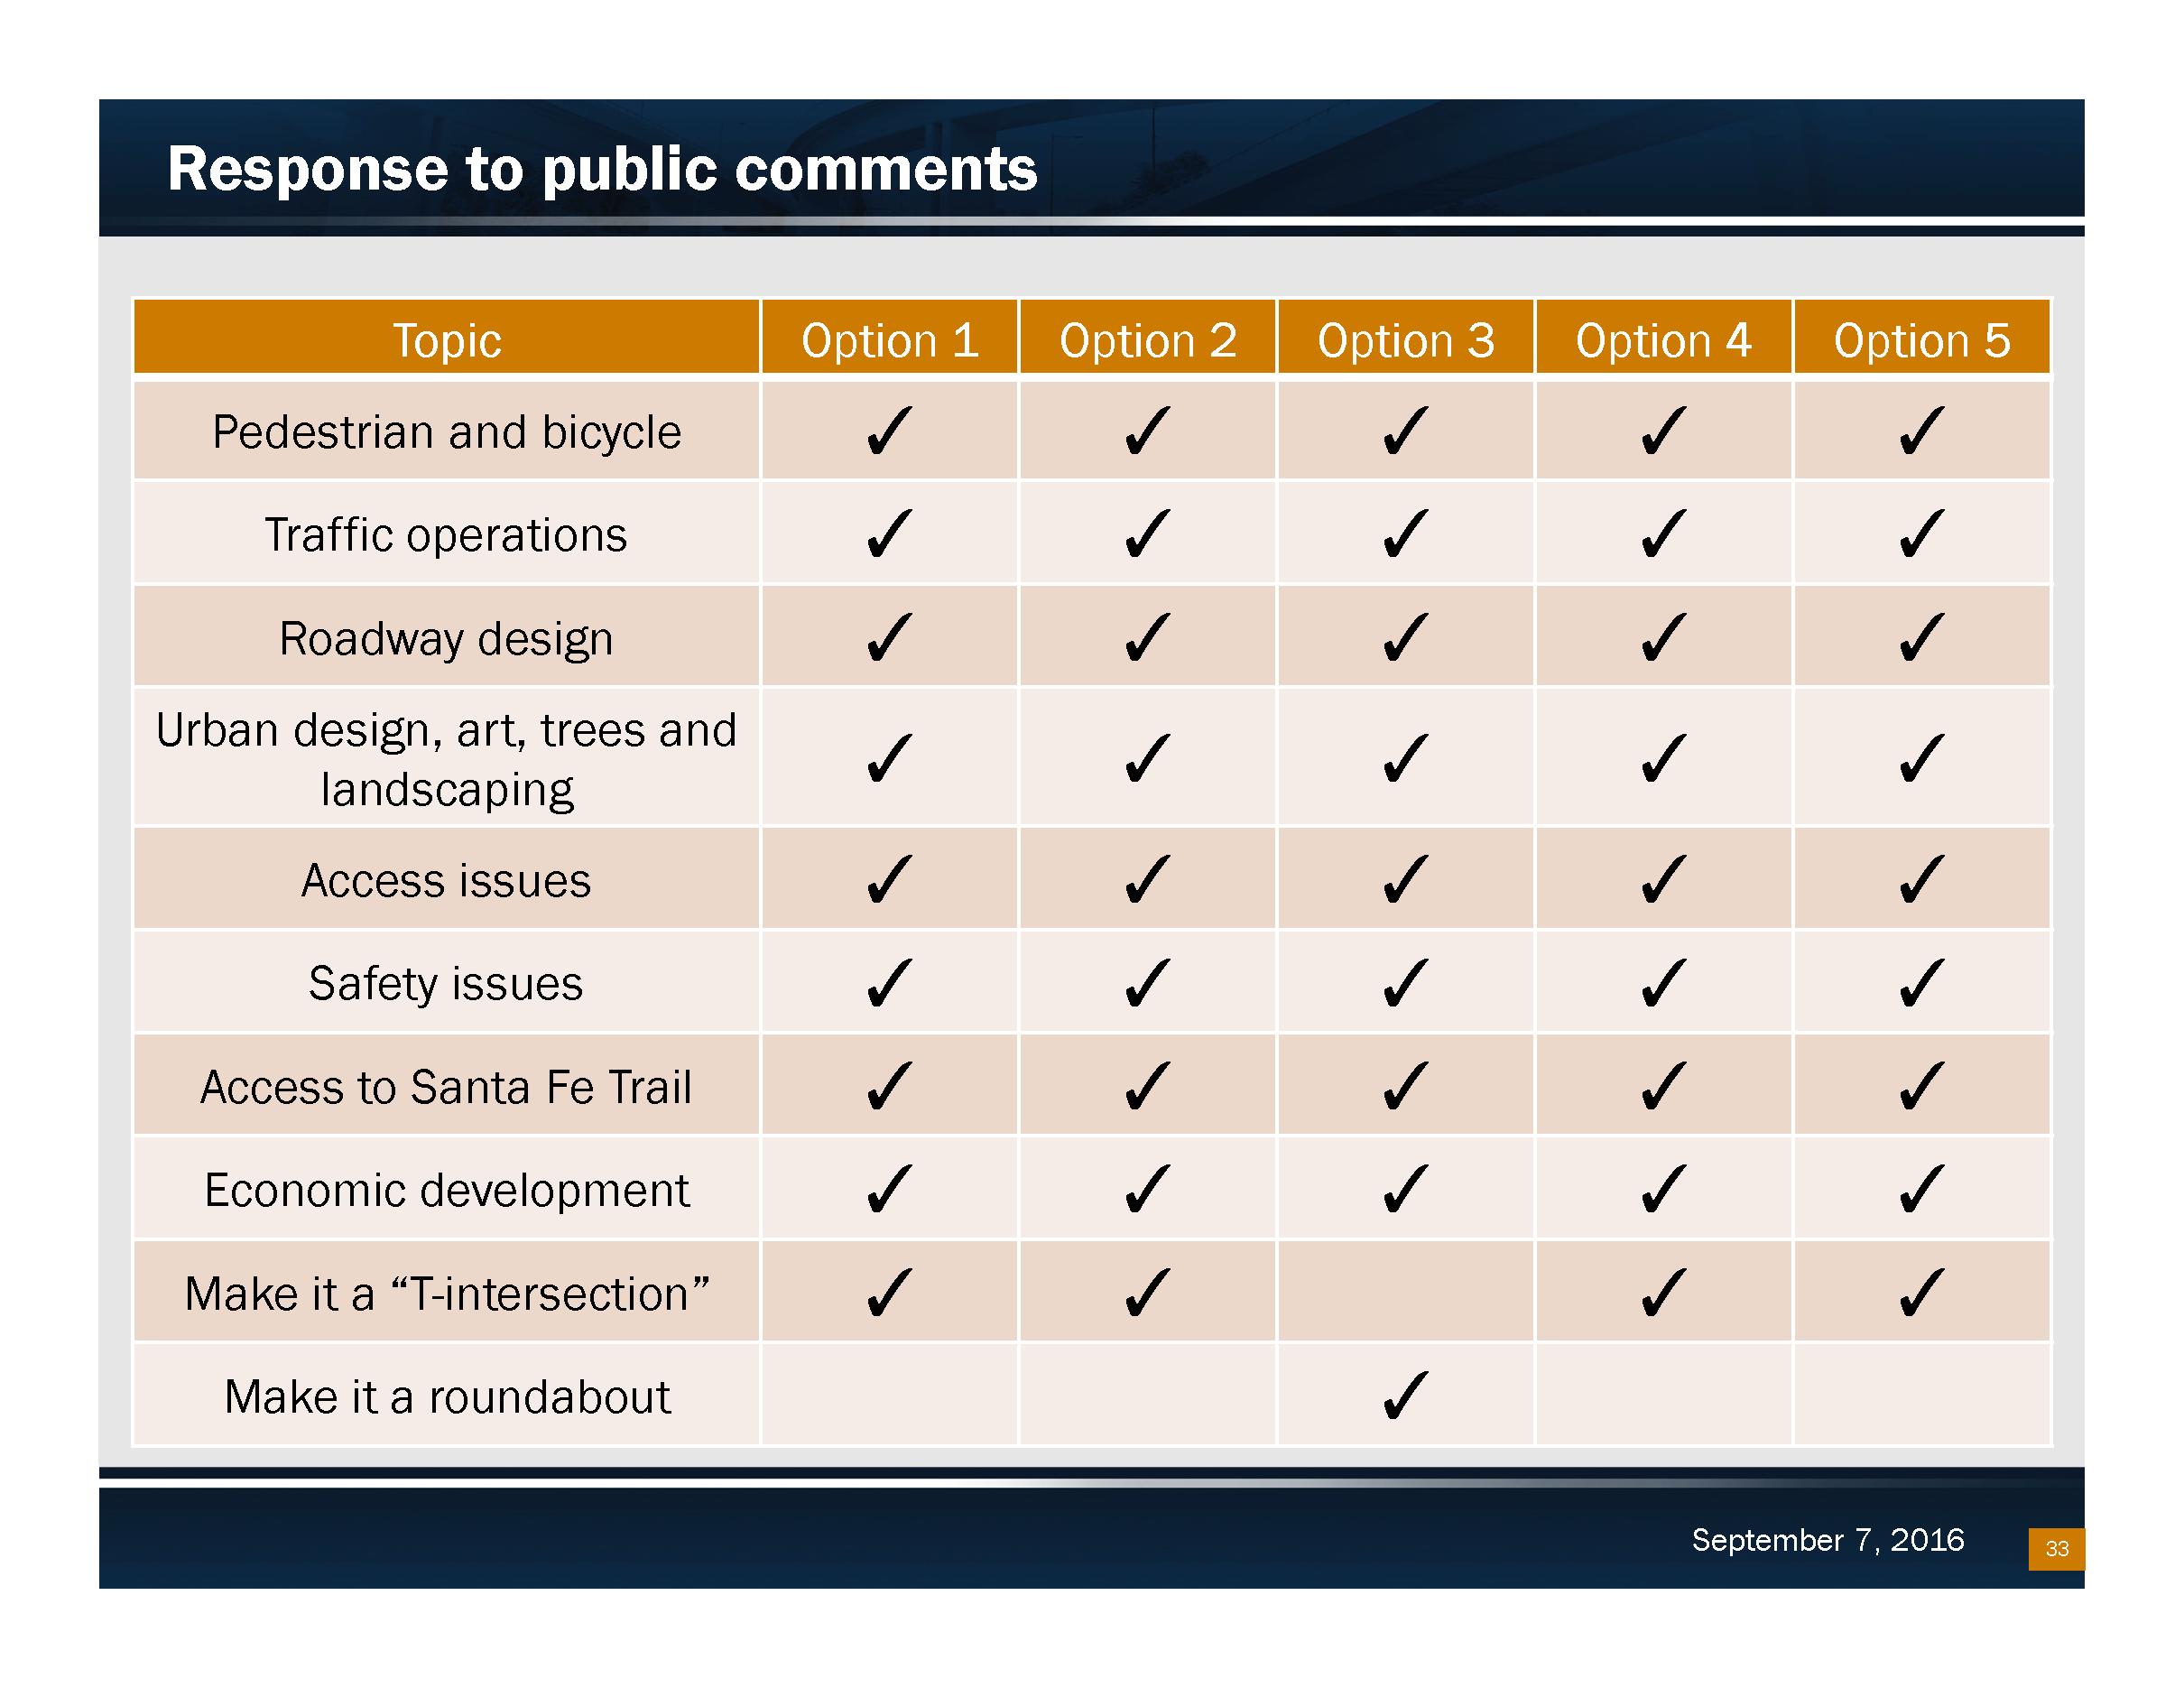 Response to Public Comments